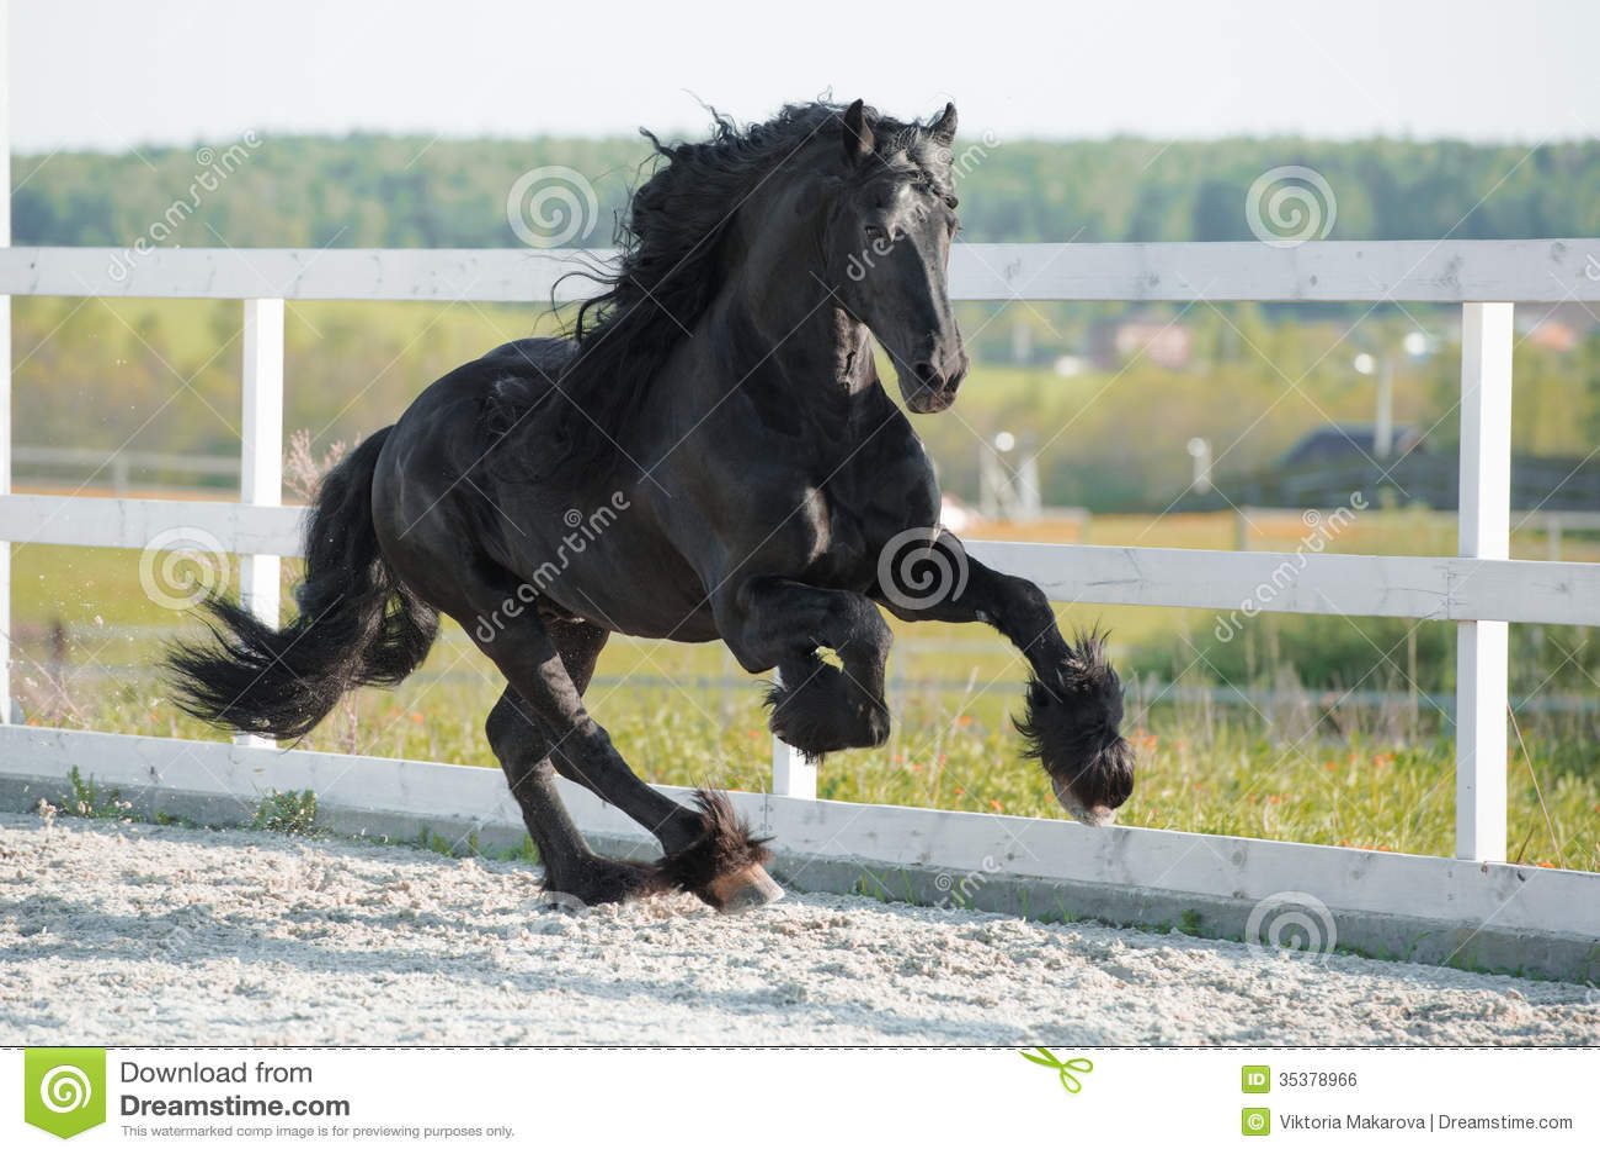 Black Friesian horse runs gallop in summer